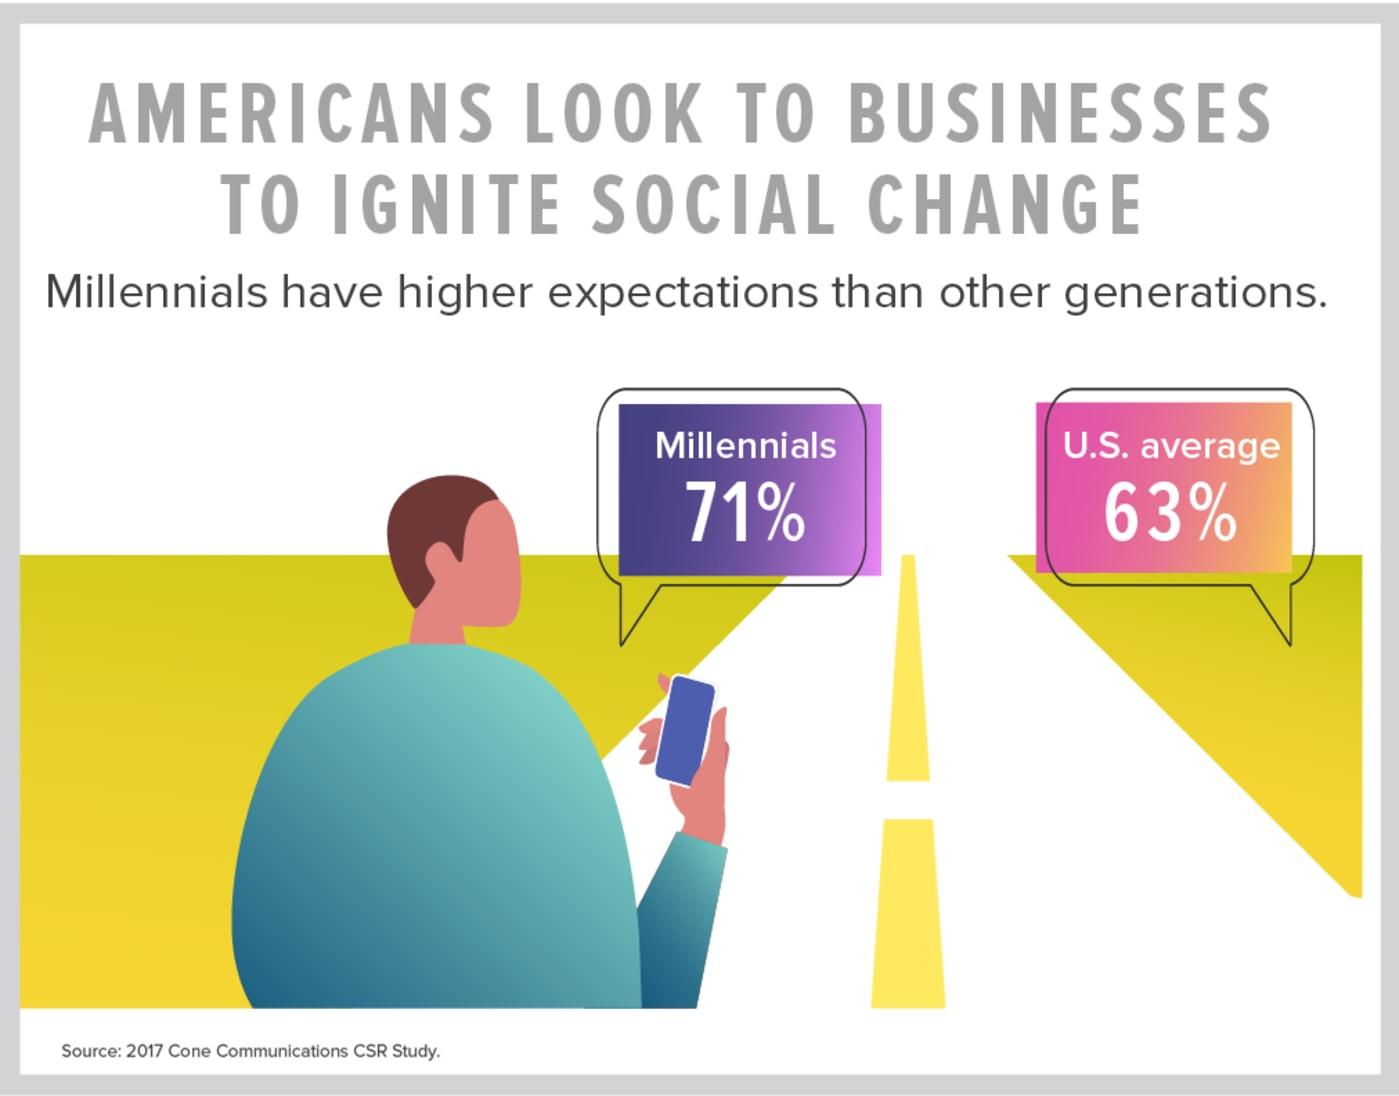 Business to ignite change